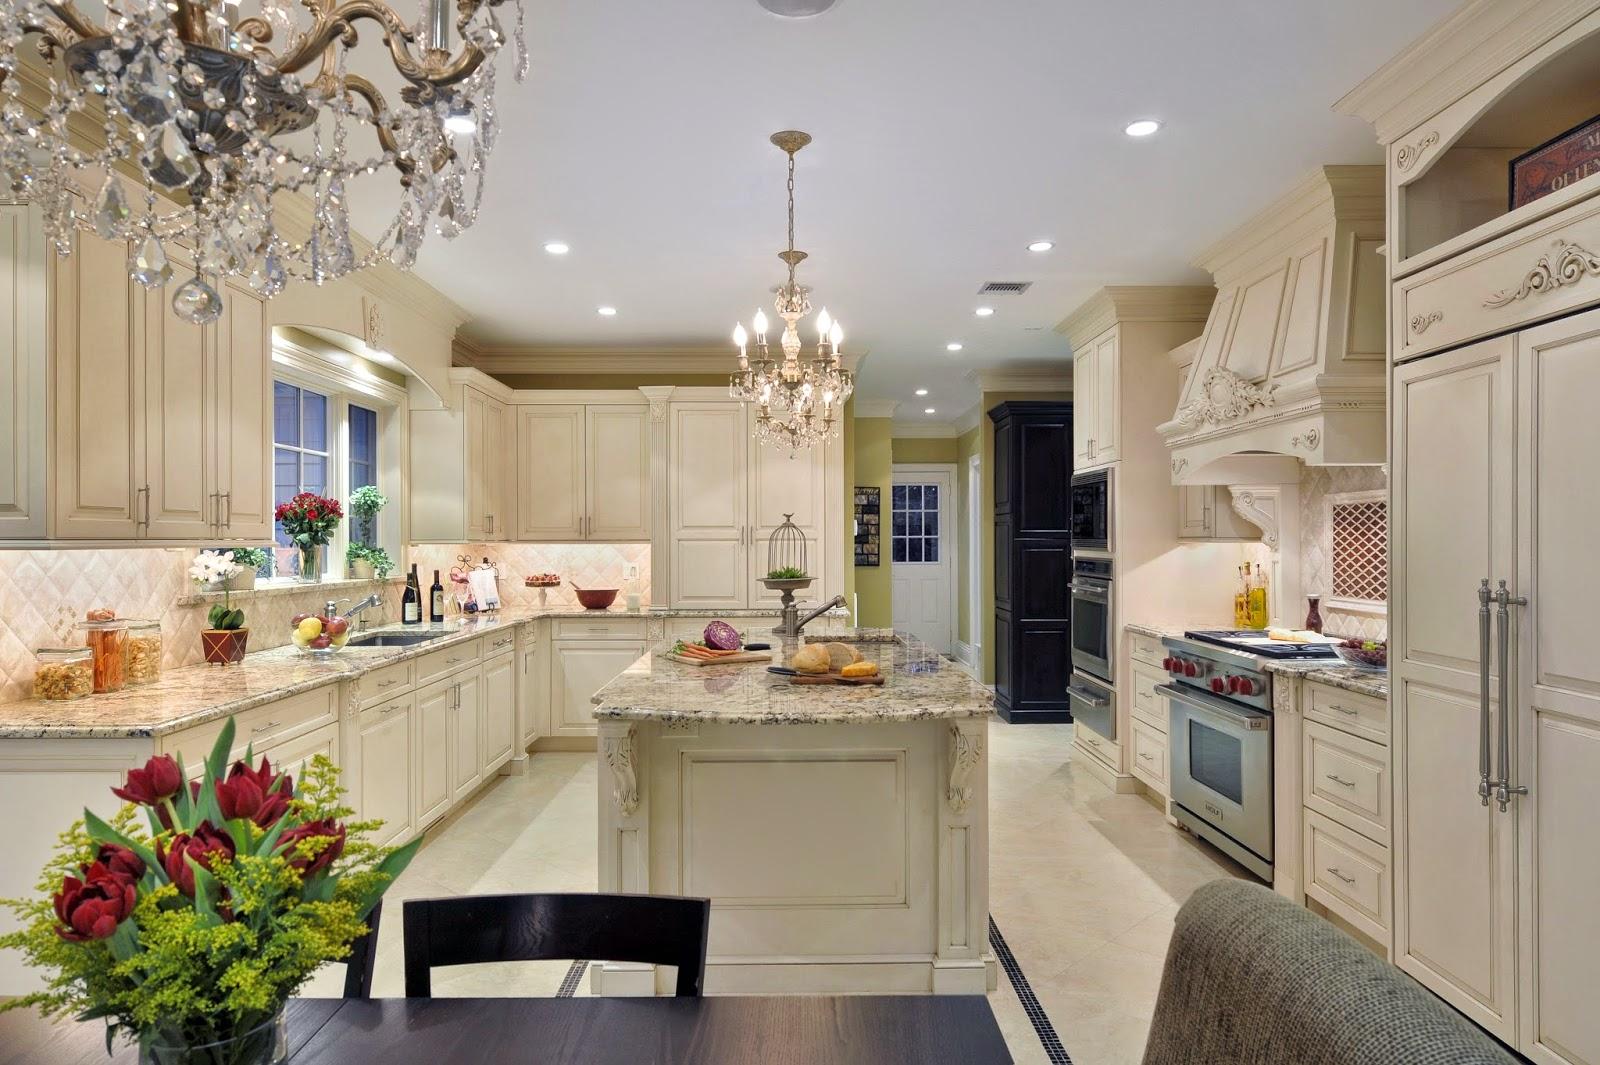 Fox Kitchen Decor